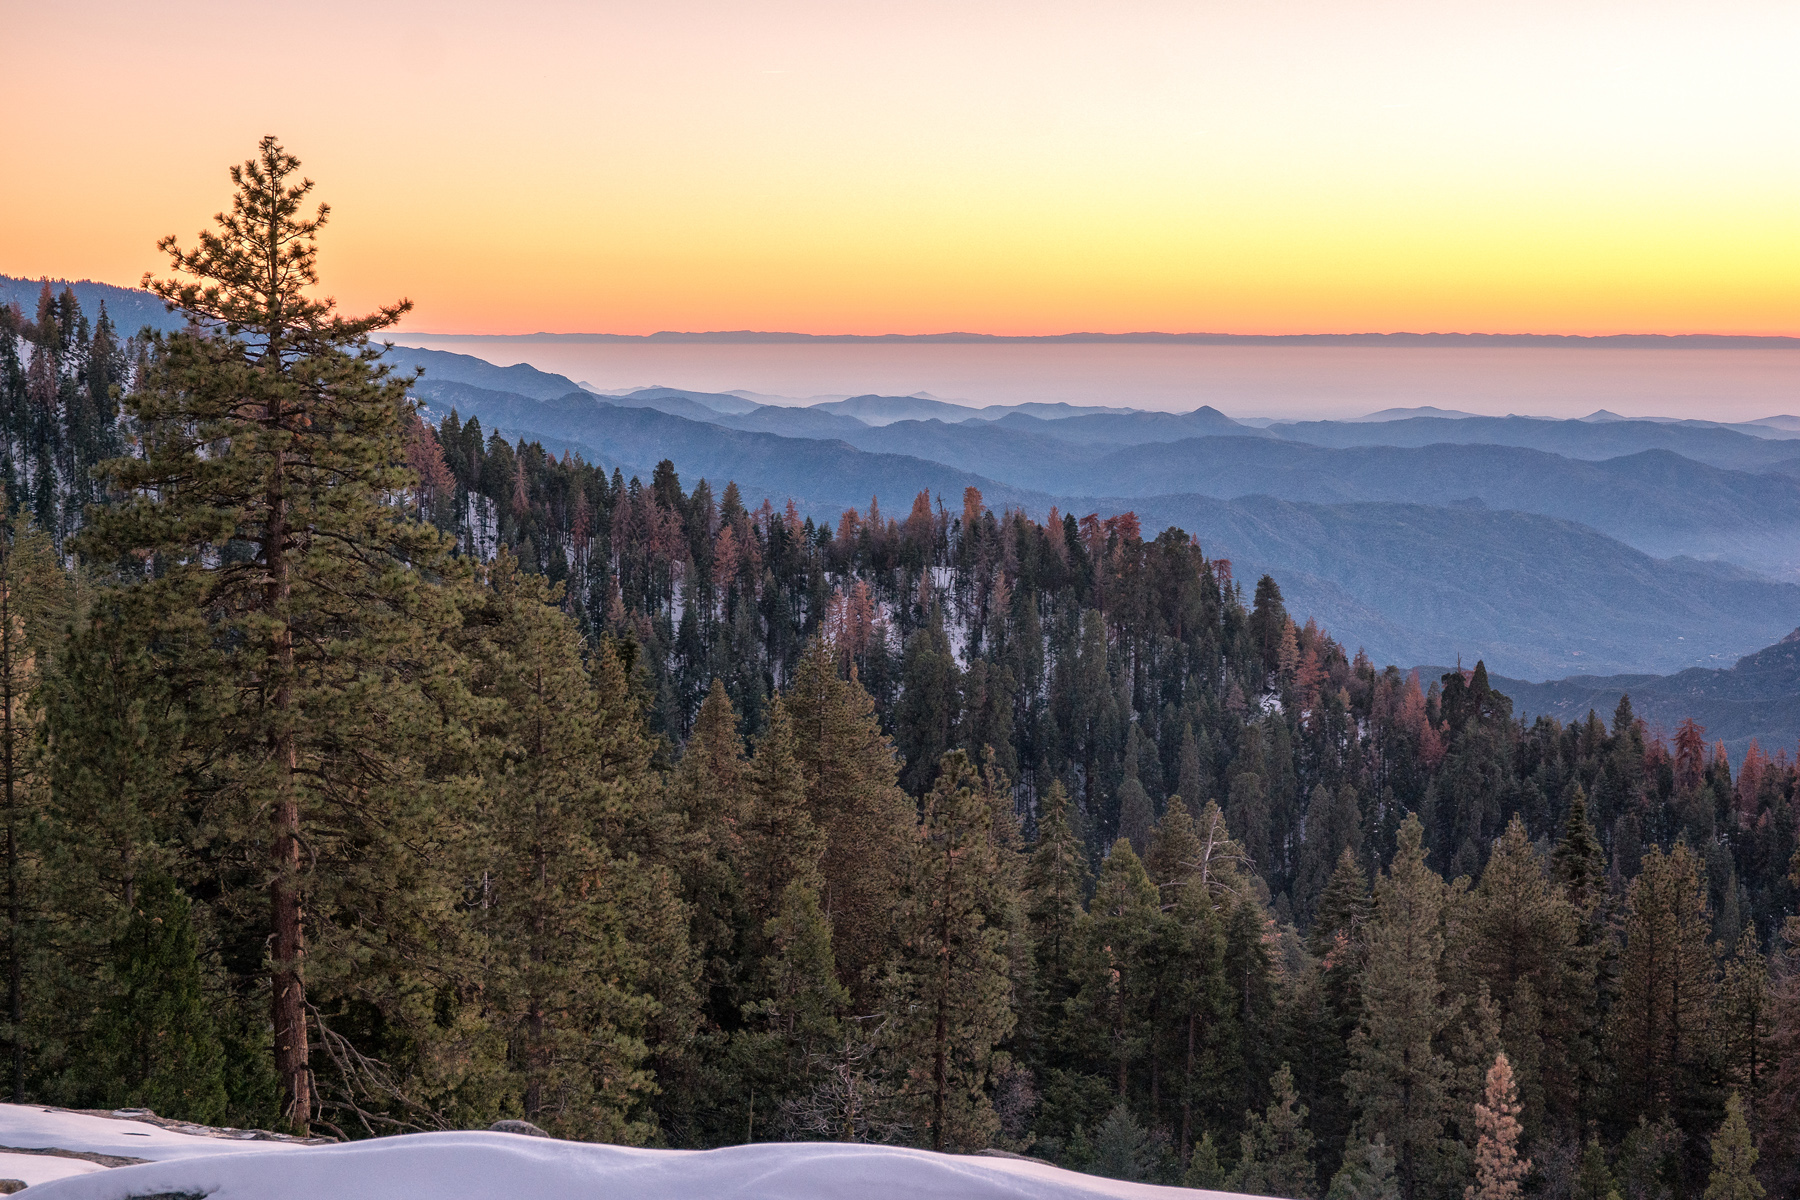 Wasim Muklashy Photography_Sequoia National Park_California_December 2015_-SAM_4205-Edit.jpg